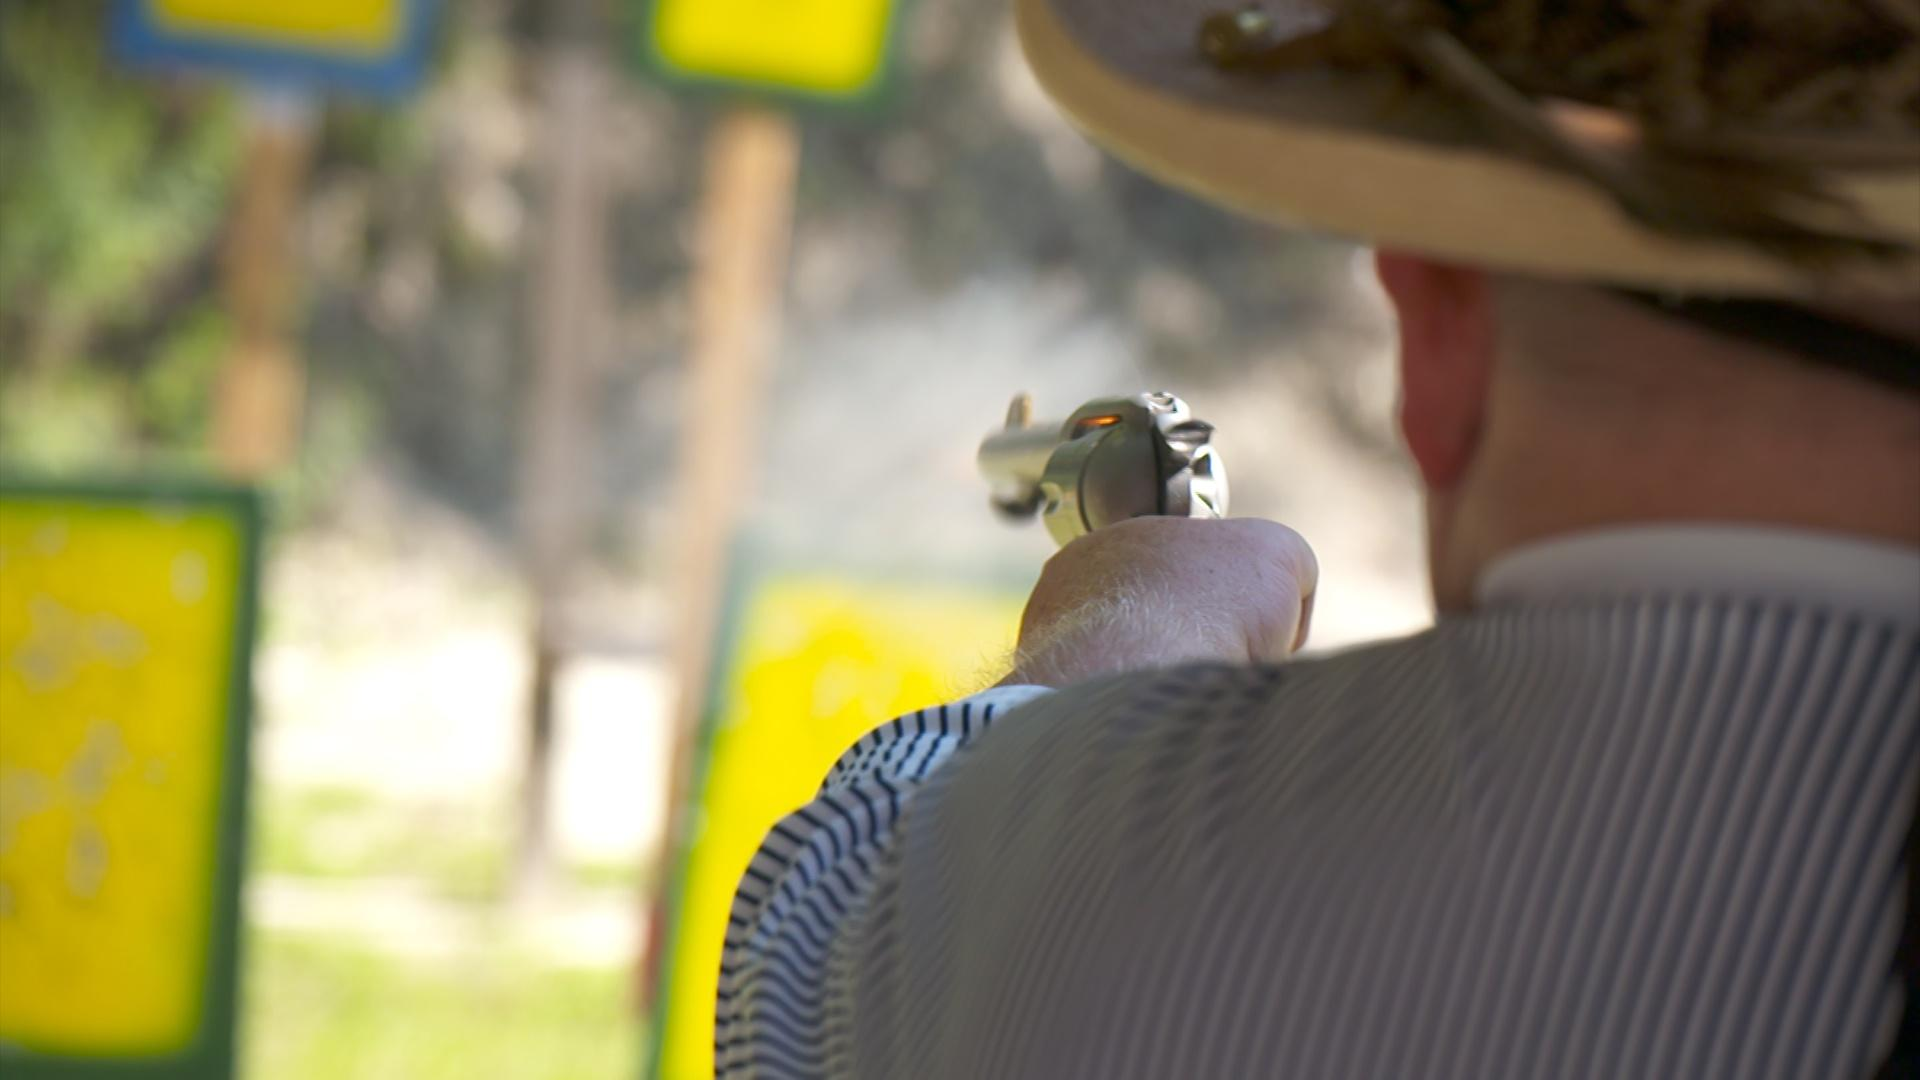 Cowboy action Shooting!